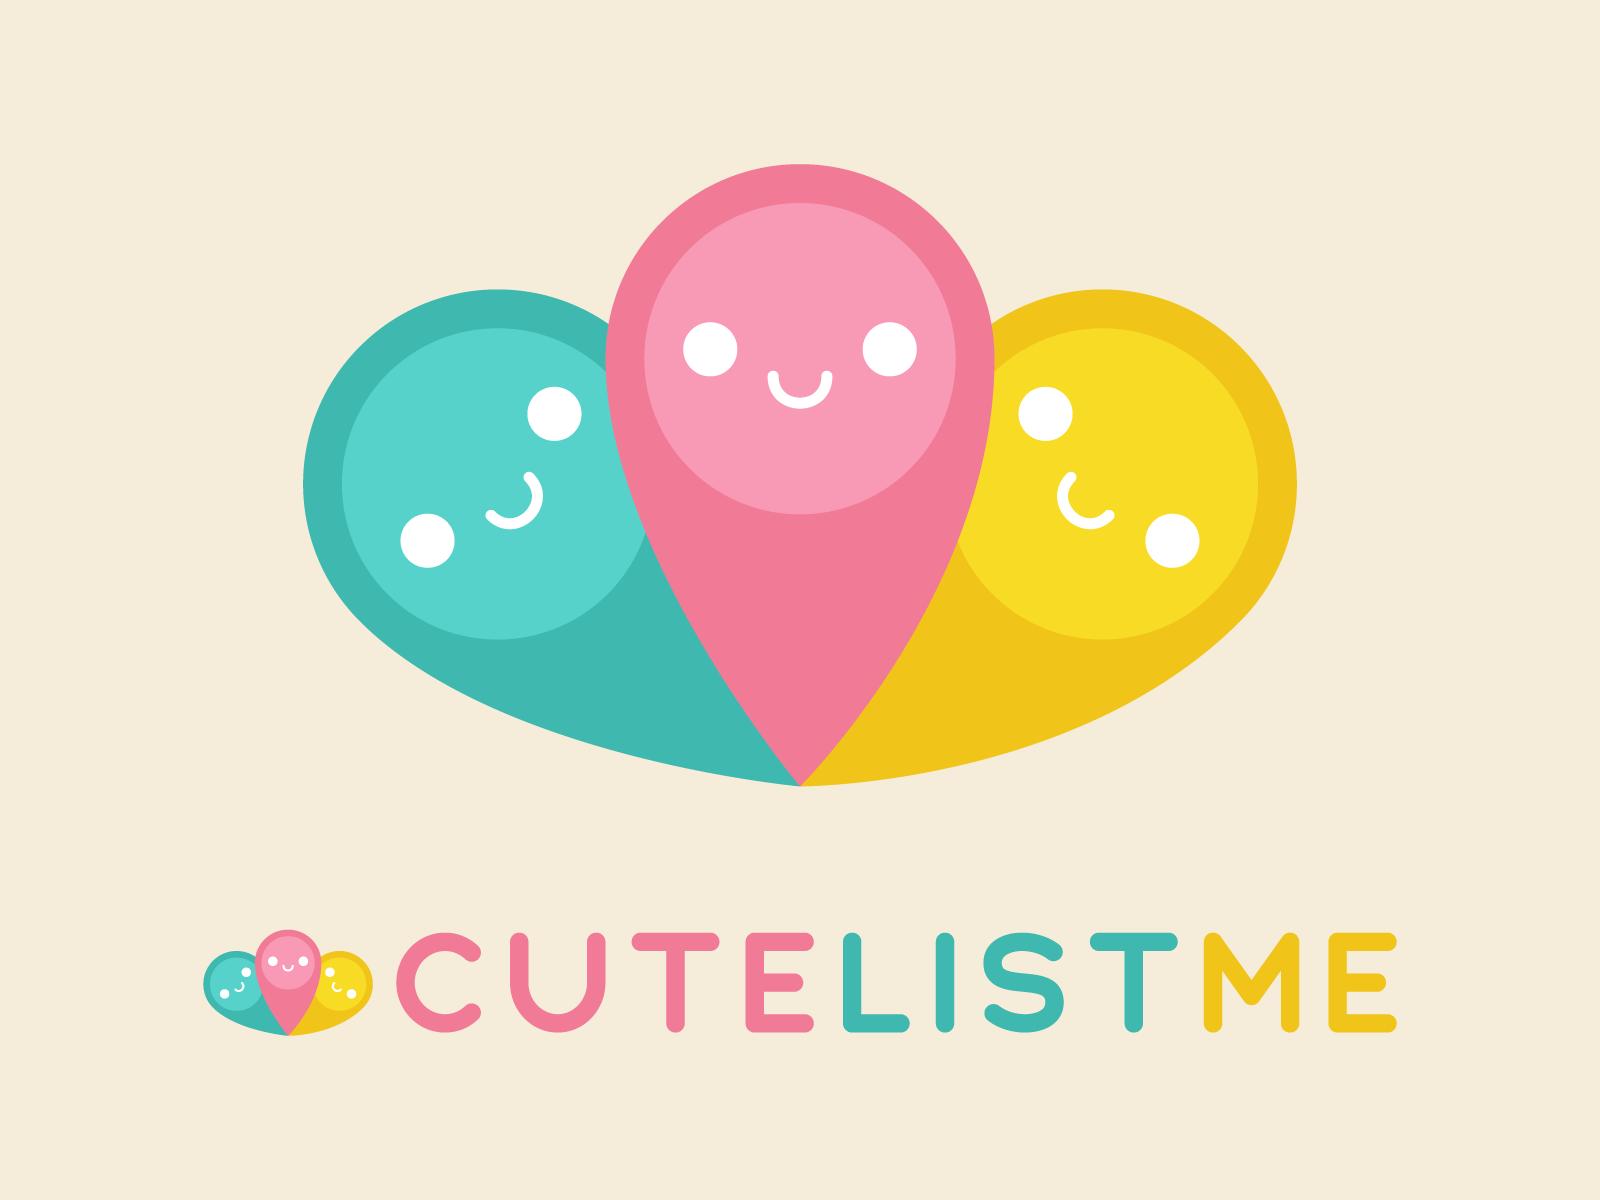 Cutelist Me Logo